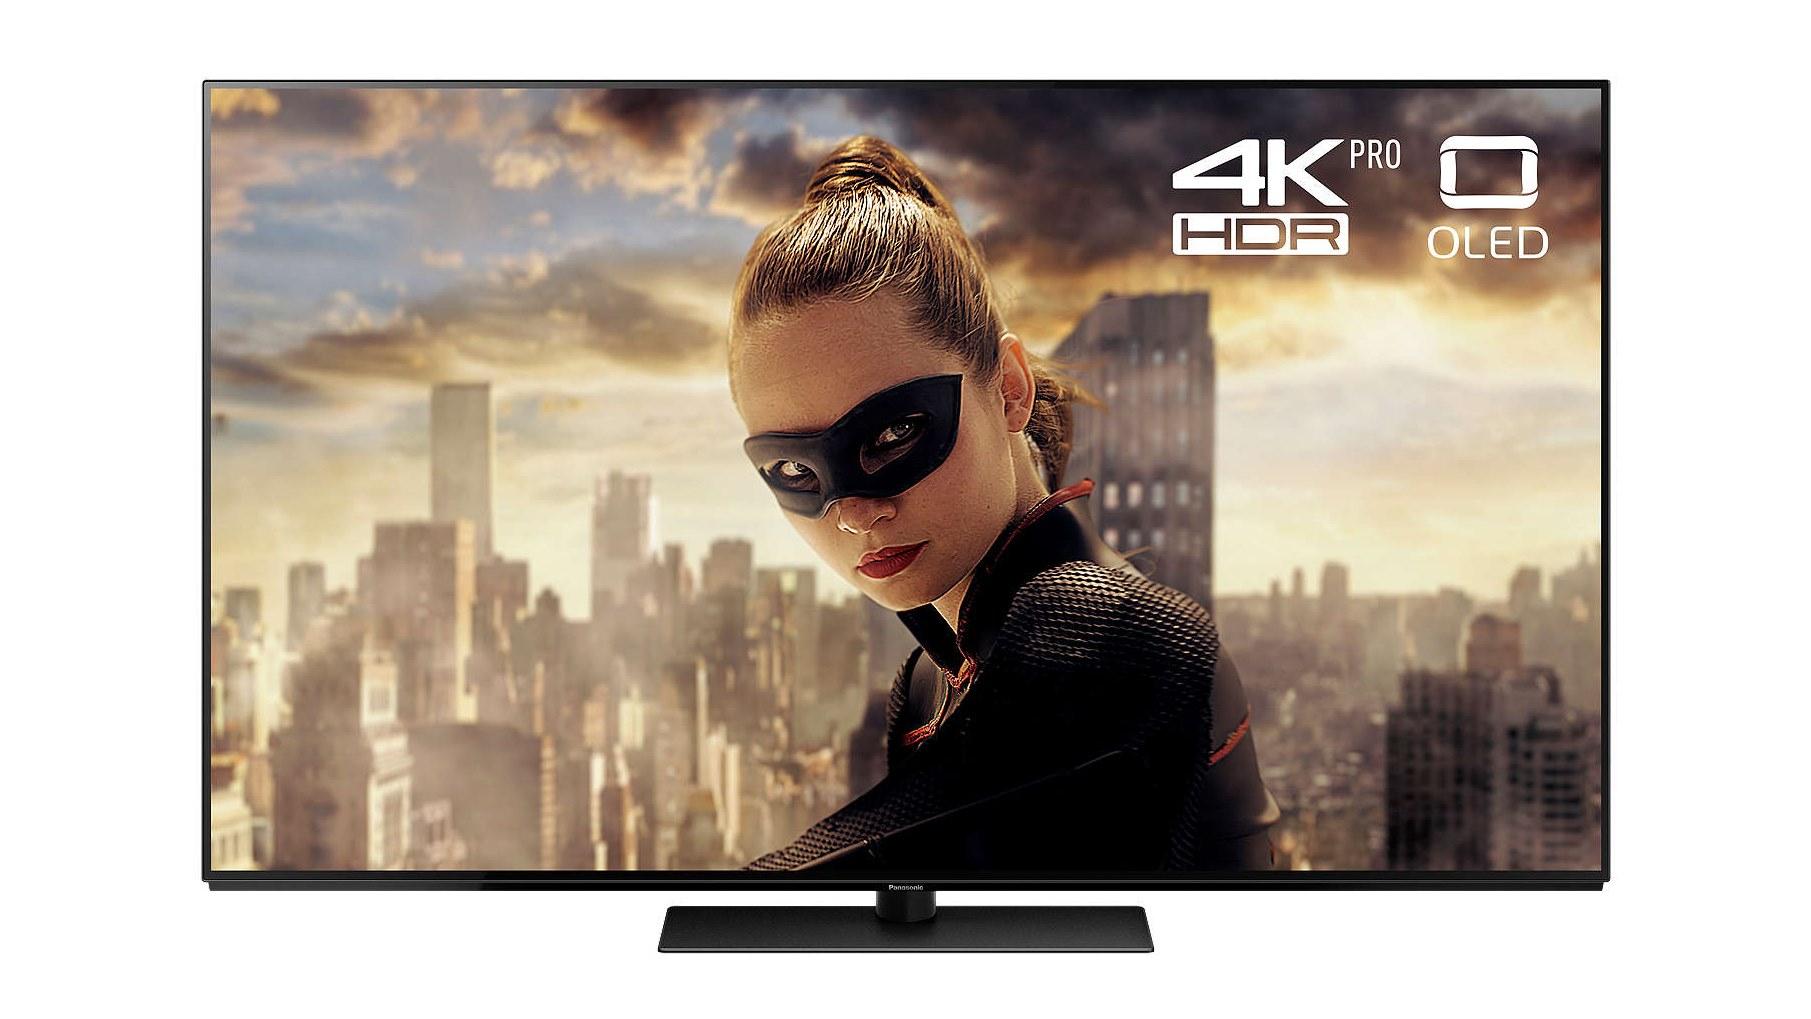 Panasonic 55FZ802B 4K OLED TV now only £1399 @ Power Direct